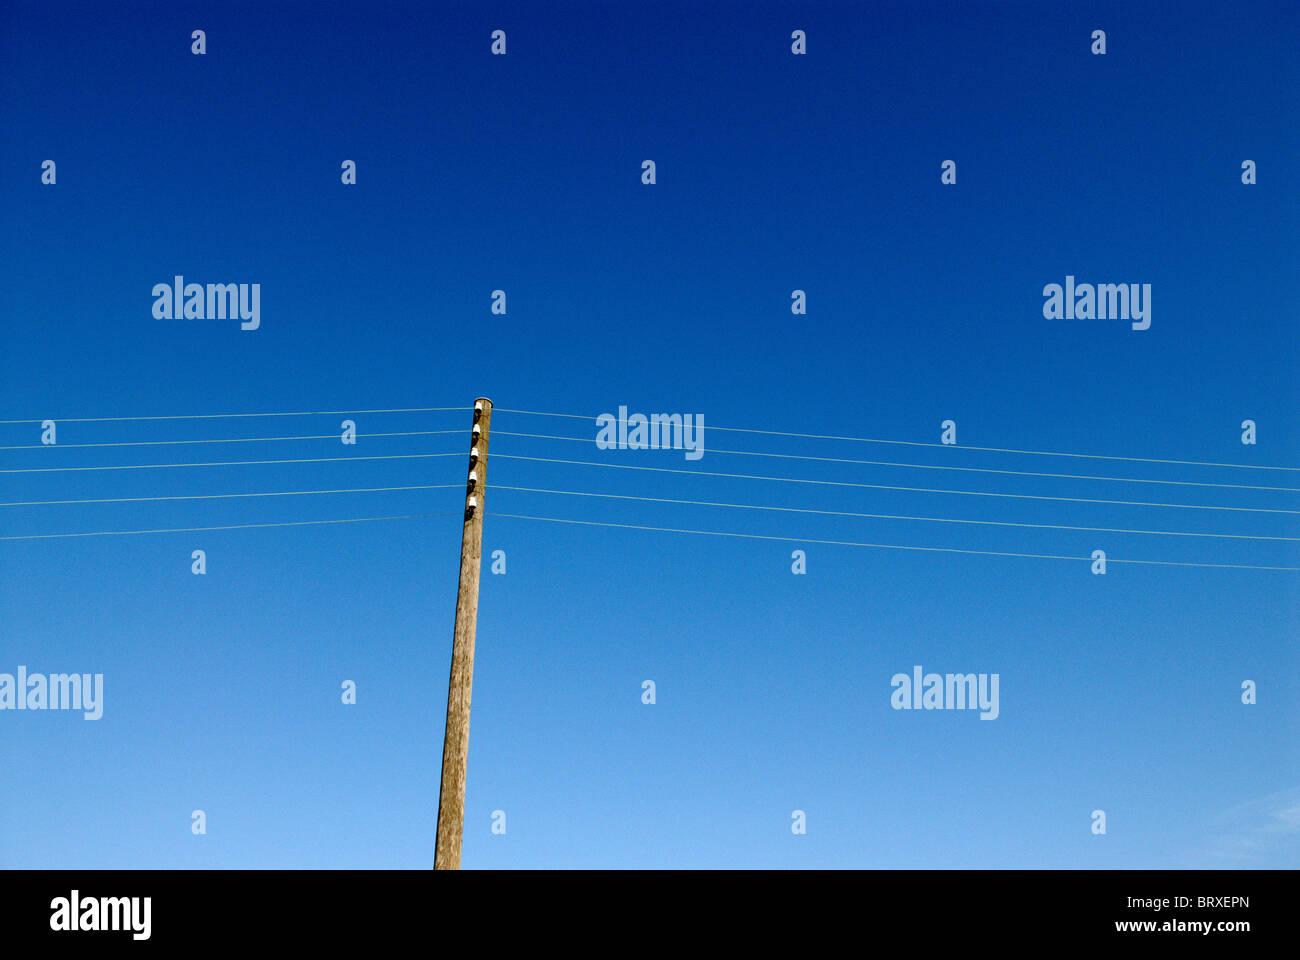 PYLON WITH POWER LINES - Stock Image